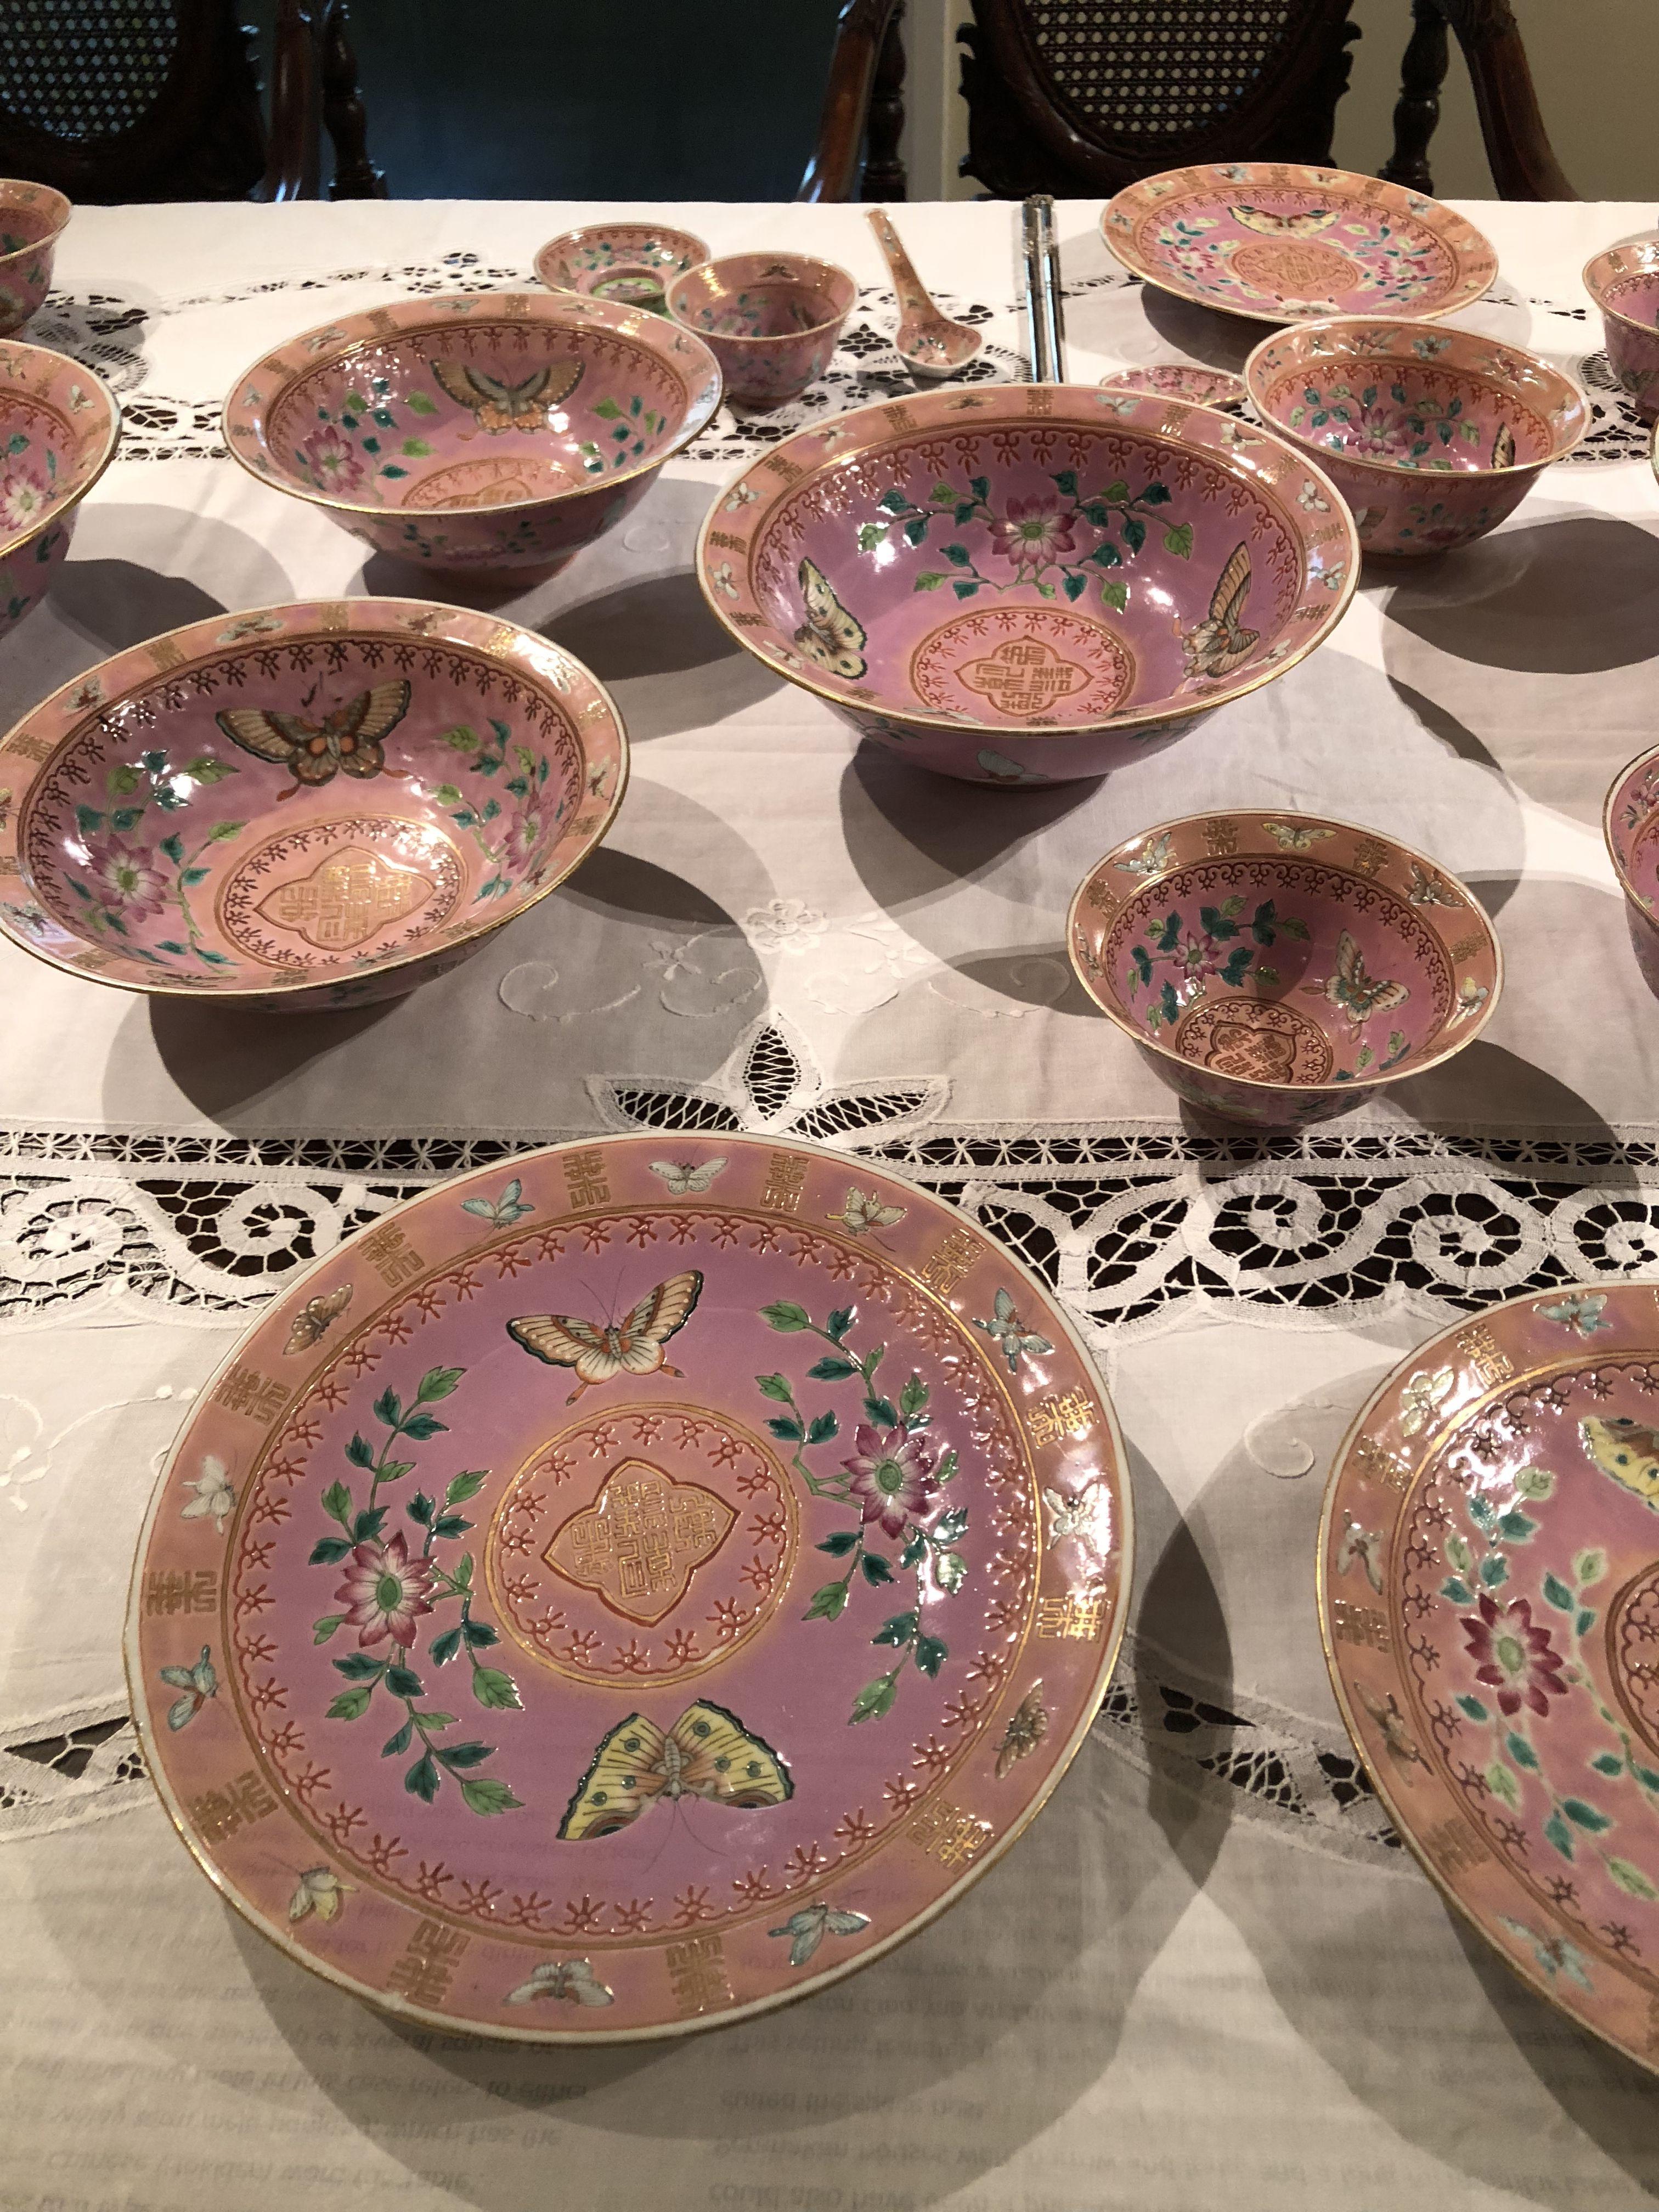 Peranakan Table Setting On Display At The Peranakan Museum In Singapore Decorative Bowls Asian Art Chinese Porcelain